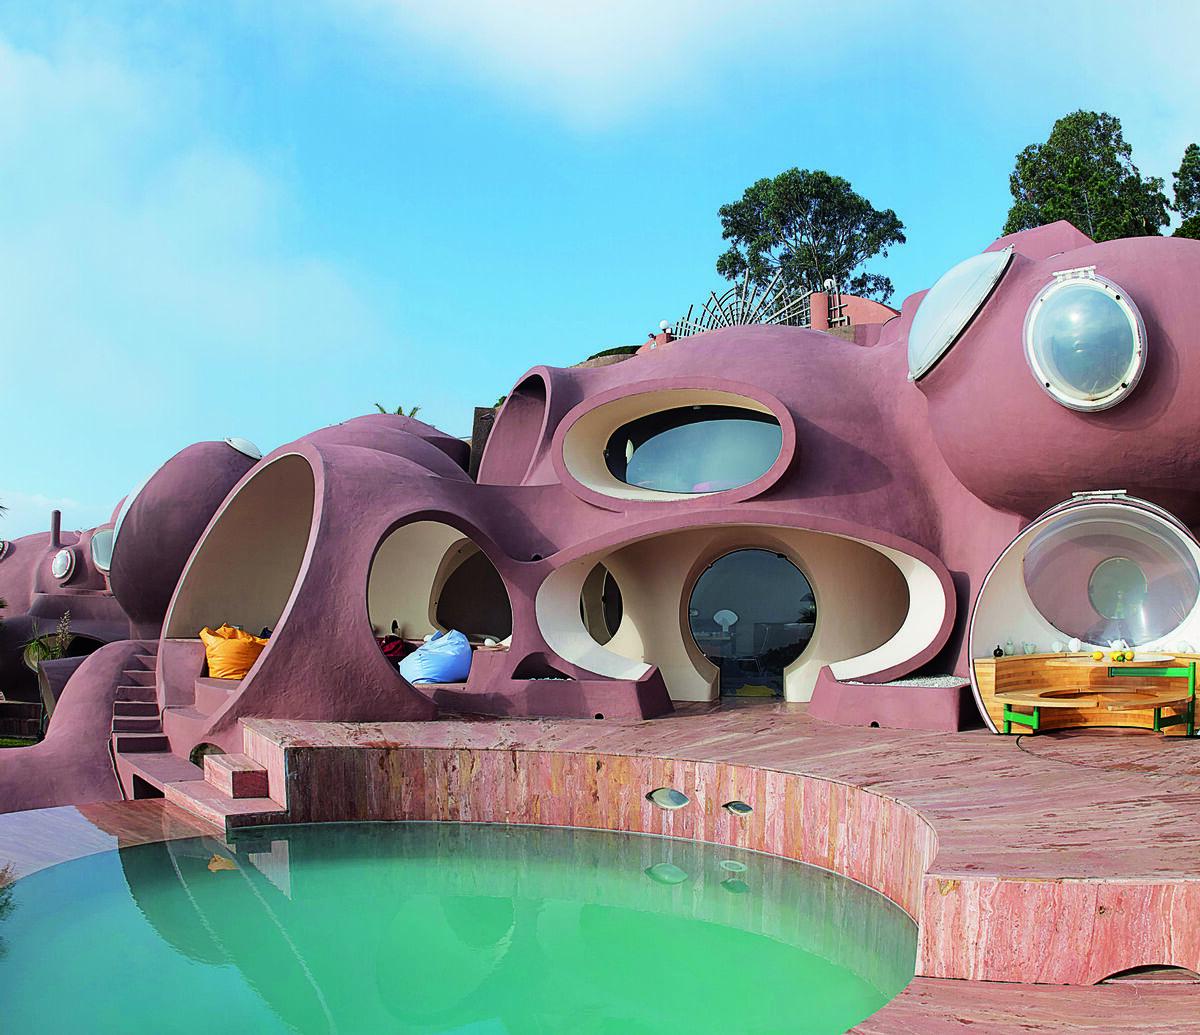 Antti Lovag, Bubble Palace, 1989, Théoule-sur-Mer, France. Photo Yves Gellie for The Maison Bernard Endowment Fund. Courtesy of Phaidon.